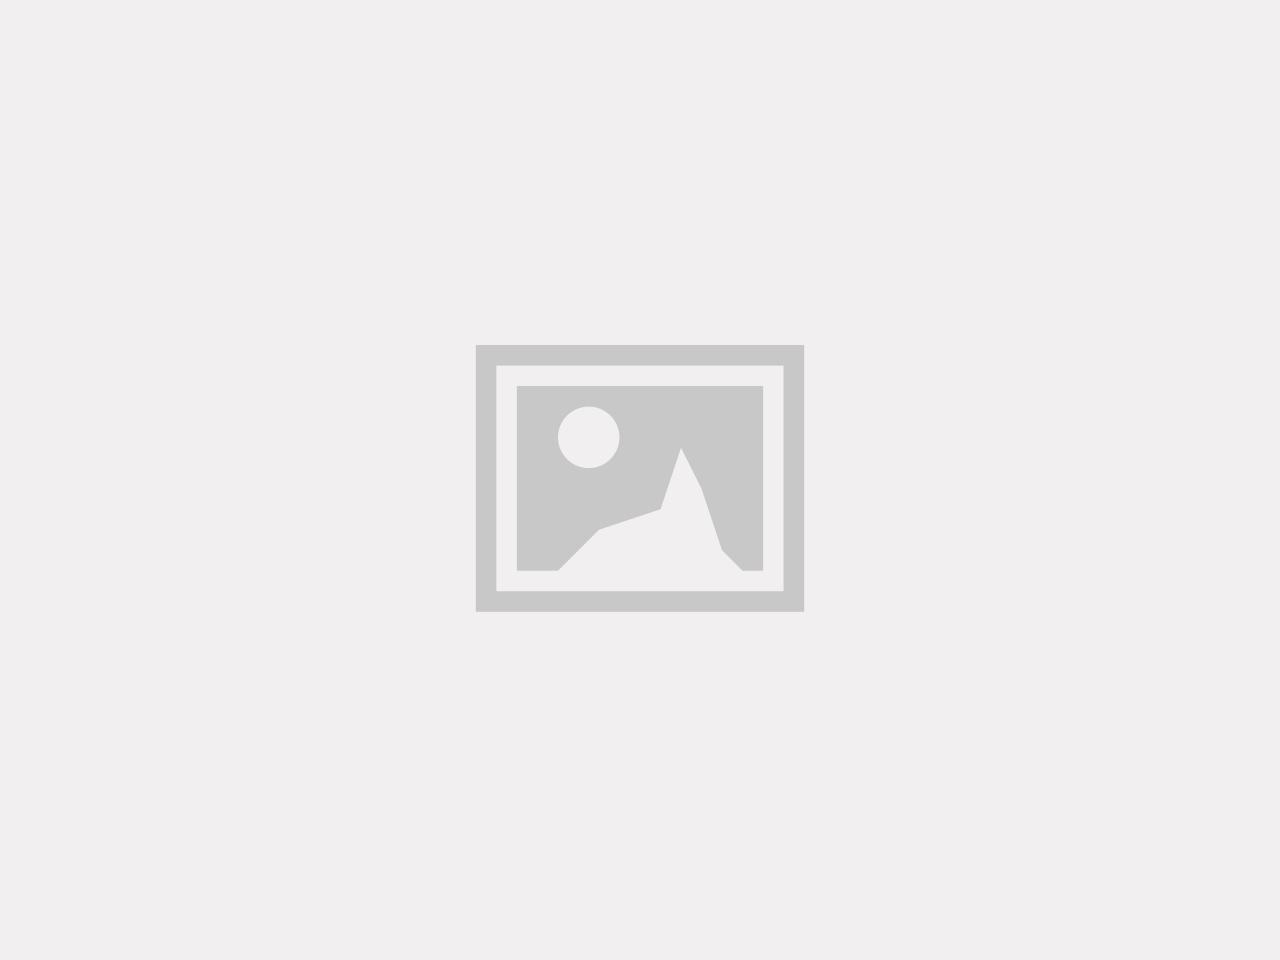 Limex, katthalsband, 10mm/22-35cm